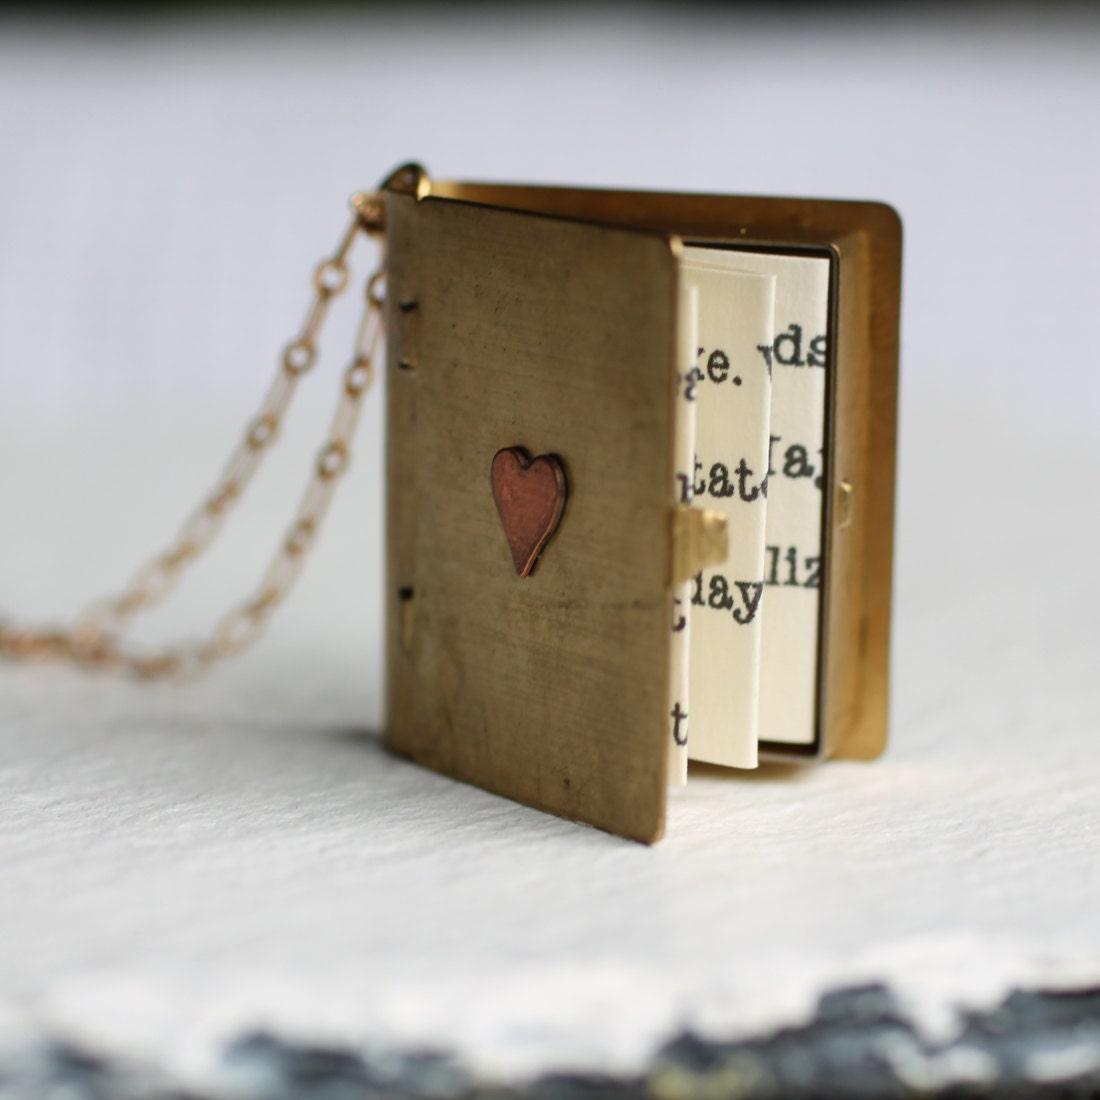 Book Locket Necklace, Secret Message Locket, Personalized Necklace, Book Lovers Necklace, Personalised Gift, Gift for Women, Graduation Gift